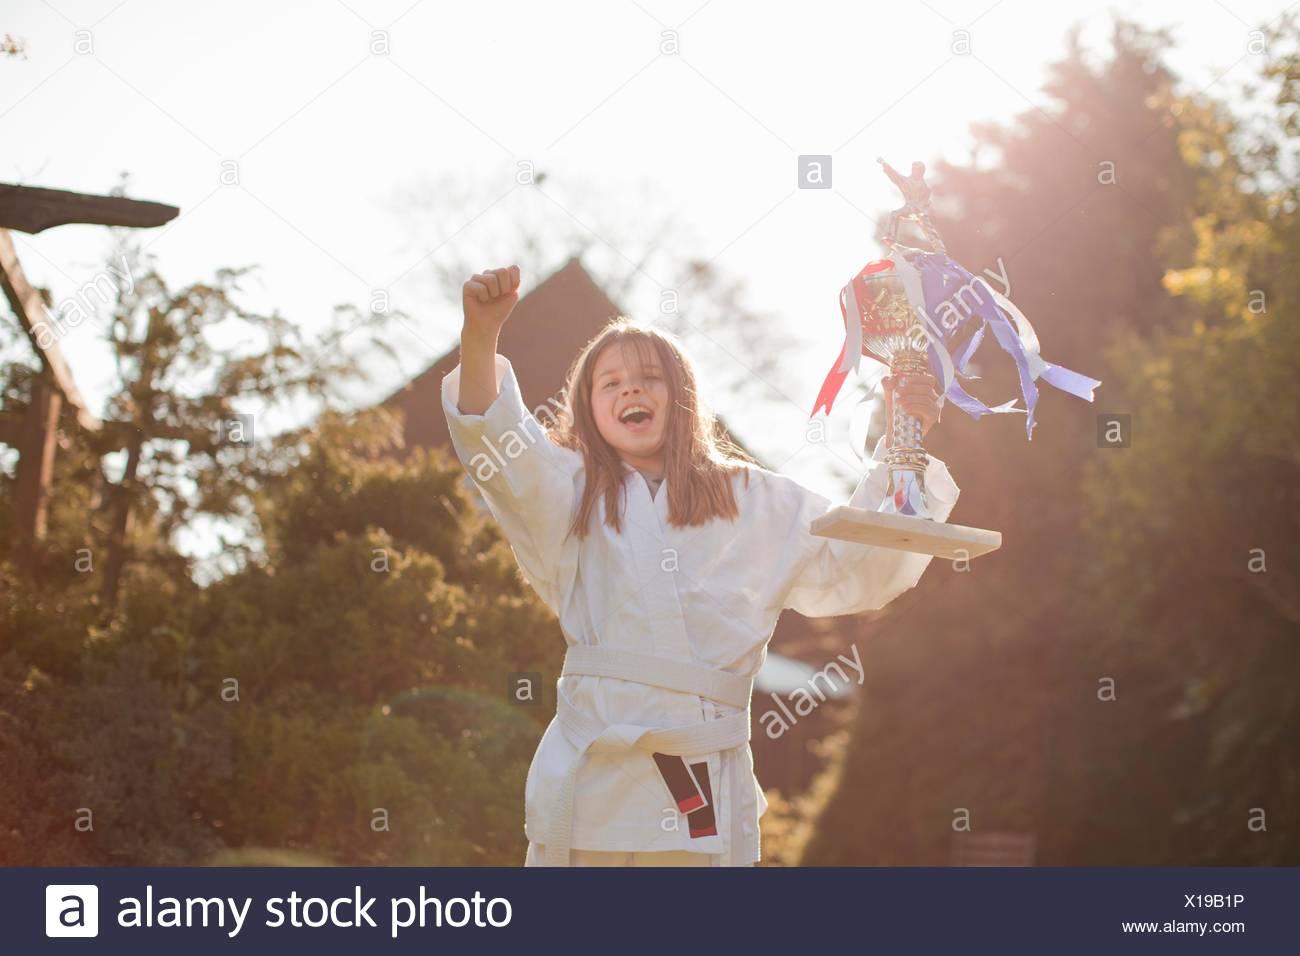 Portrait of joyous girl celebrating trophy in garden - Stock Image